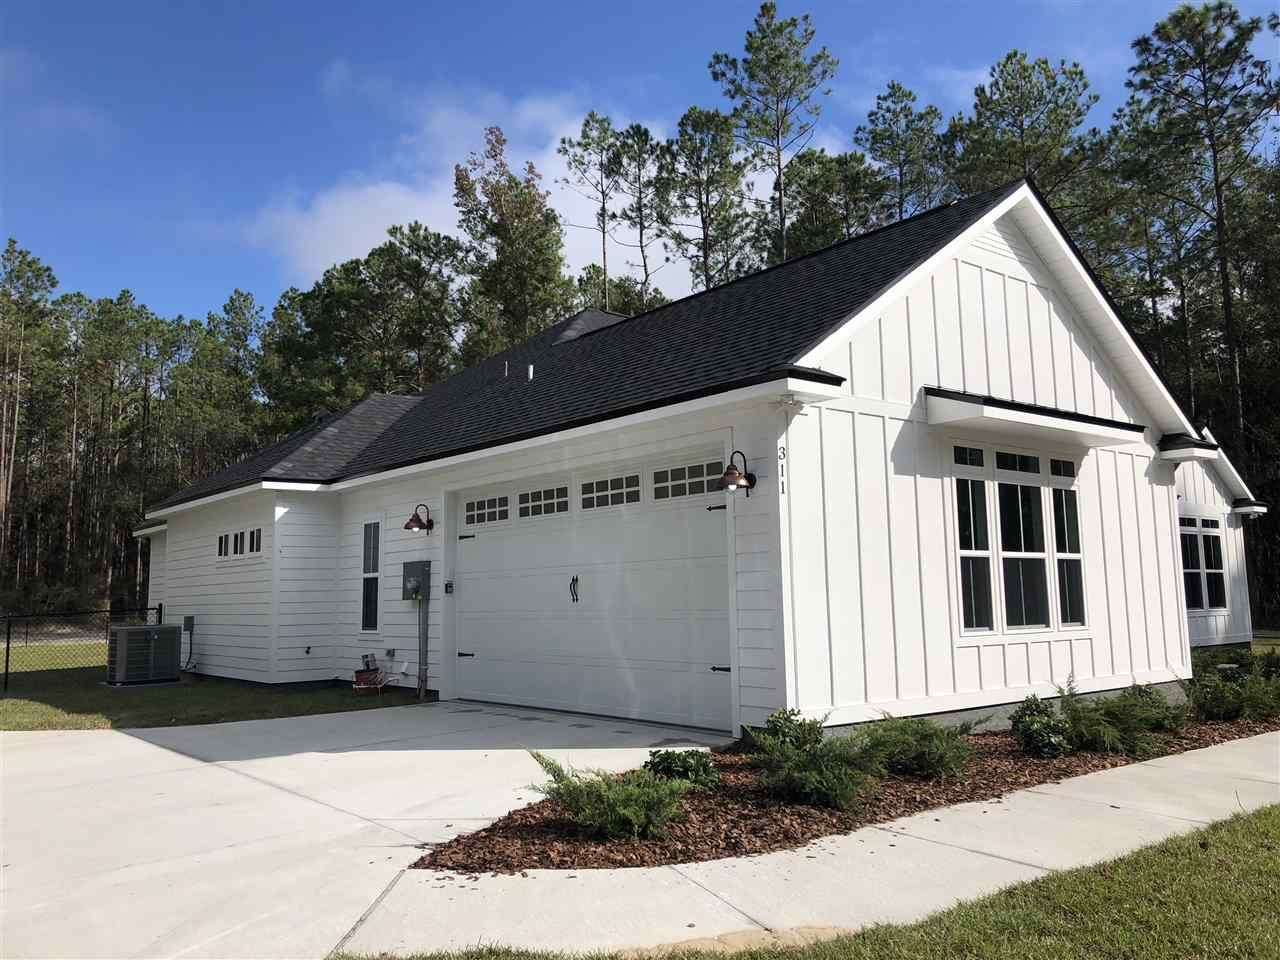 Photo of 311 Bettywood Circle, CRAWFORDVILLE, FL 32327 (MLS # 337564)